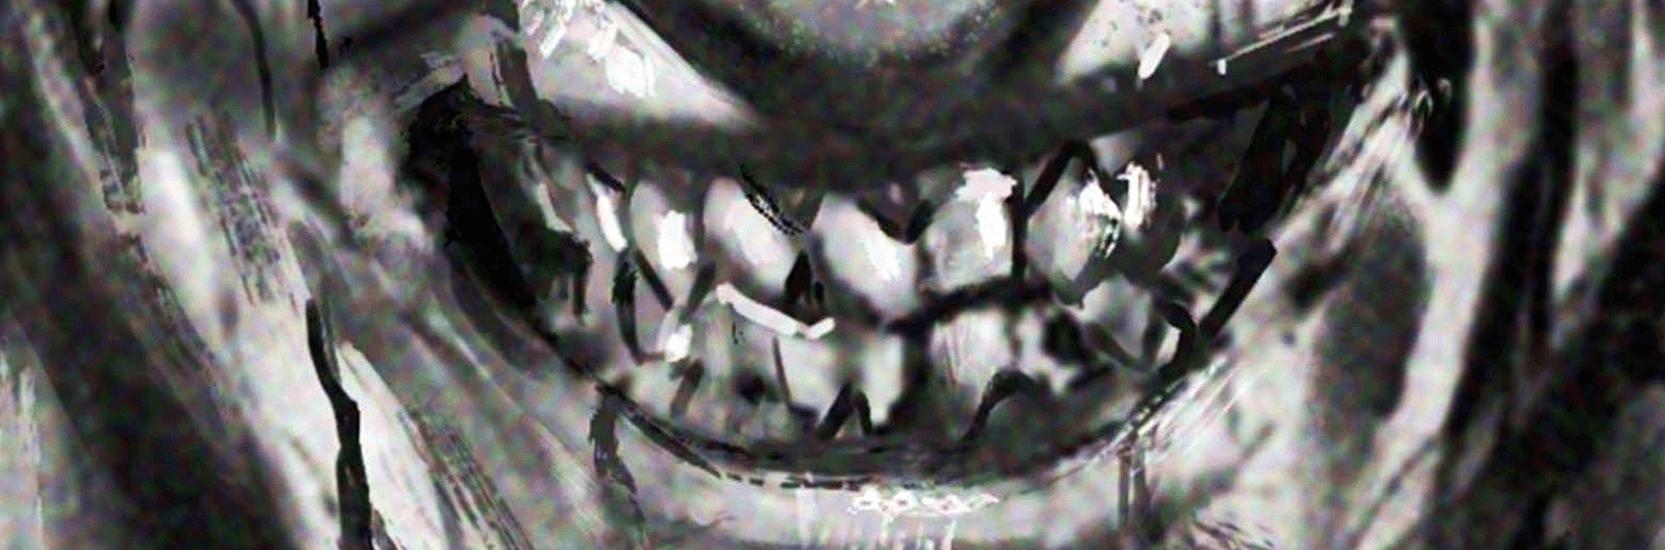 Court métrage – The Shutterbug Man